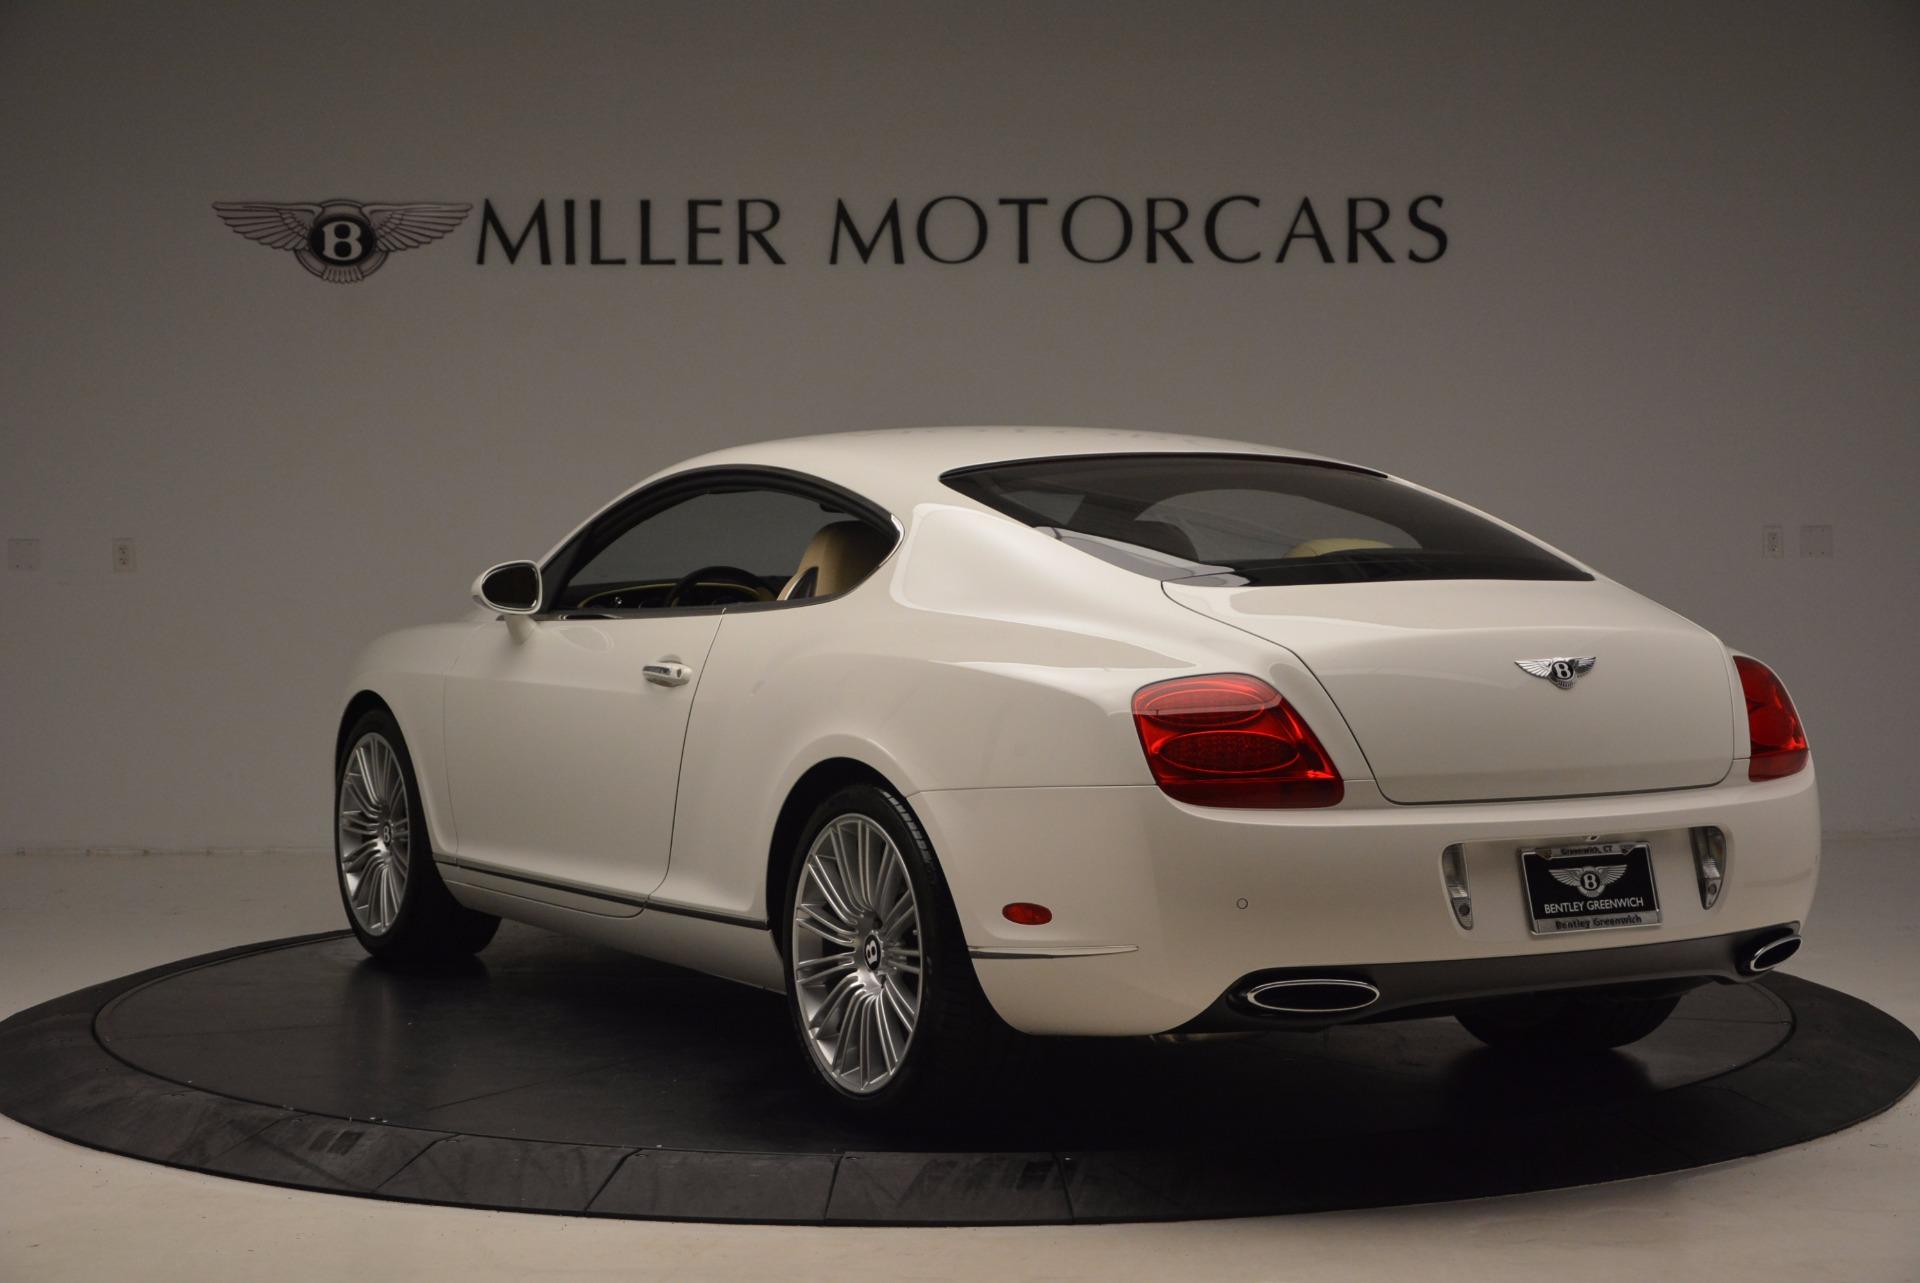 Used 2008 Bentley Continental GT Speed For Sale In Westport, CT 1552_p6